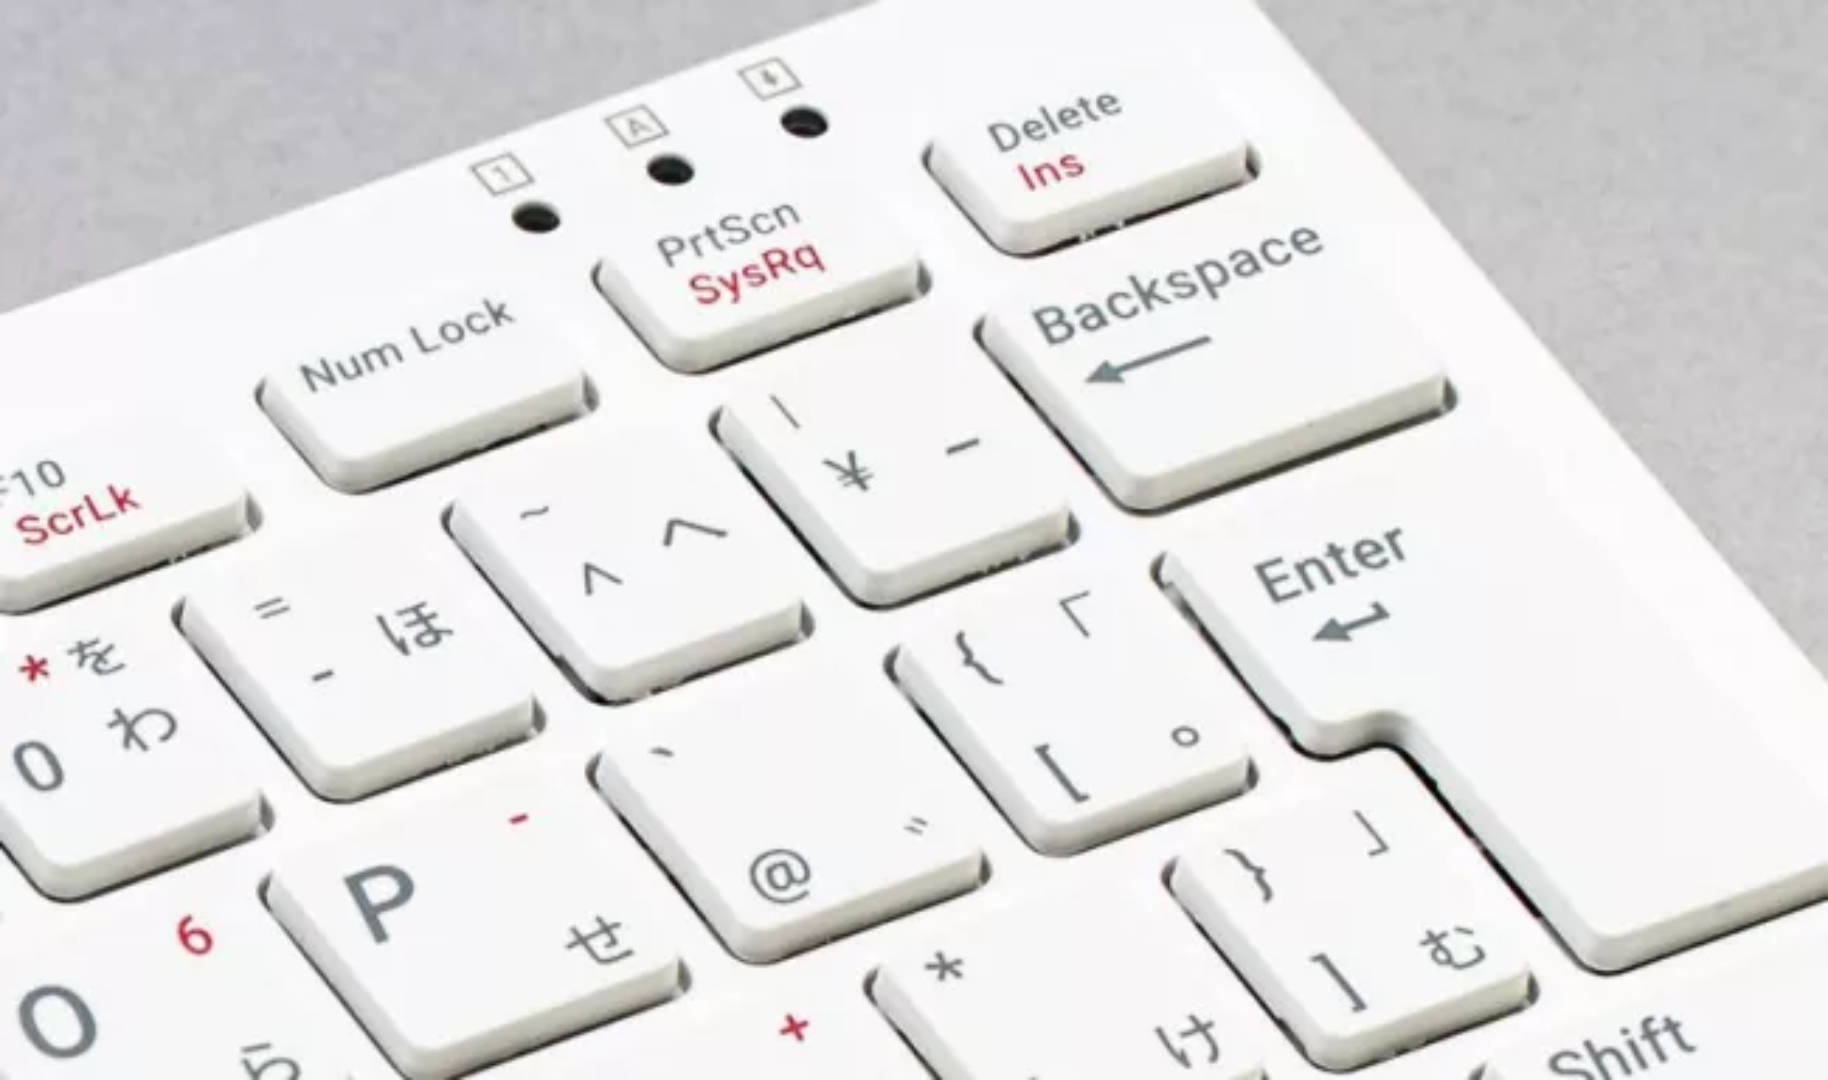 Raspberry Pi Tastiera Layout Giapponese